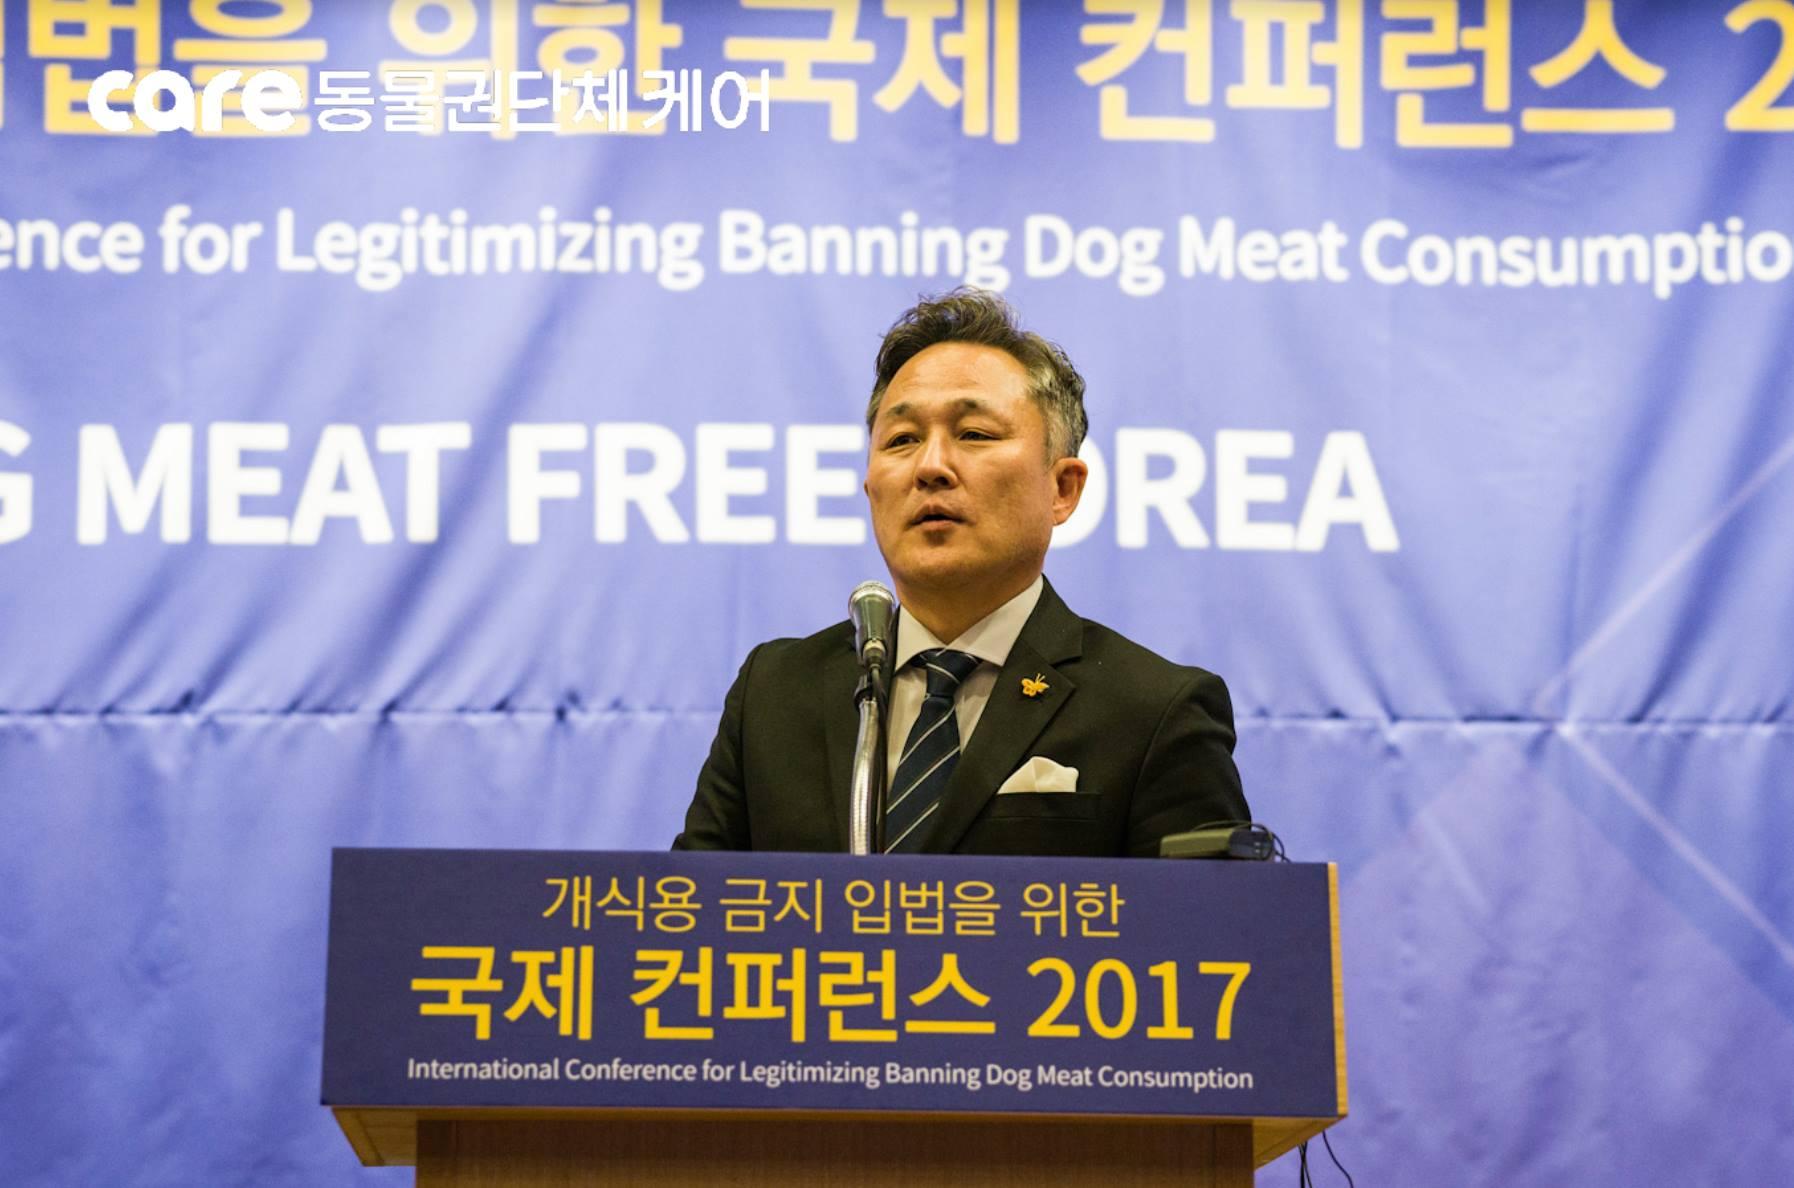 https://www.facebook.com/koreandogs/posts/2250922694925668?utm_source=sendinblue&utm_campaign=Urgent_Calls_for_Action_and_Significant_Positive_Development_in_Korea!&utm_medium=email